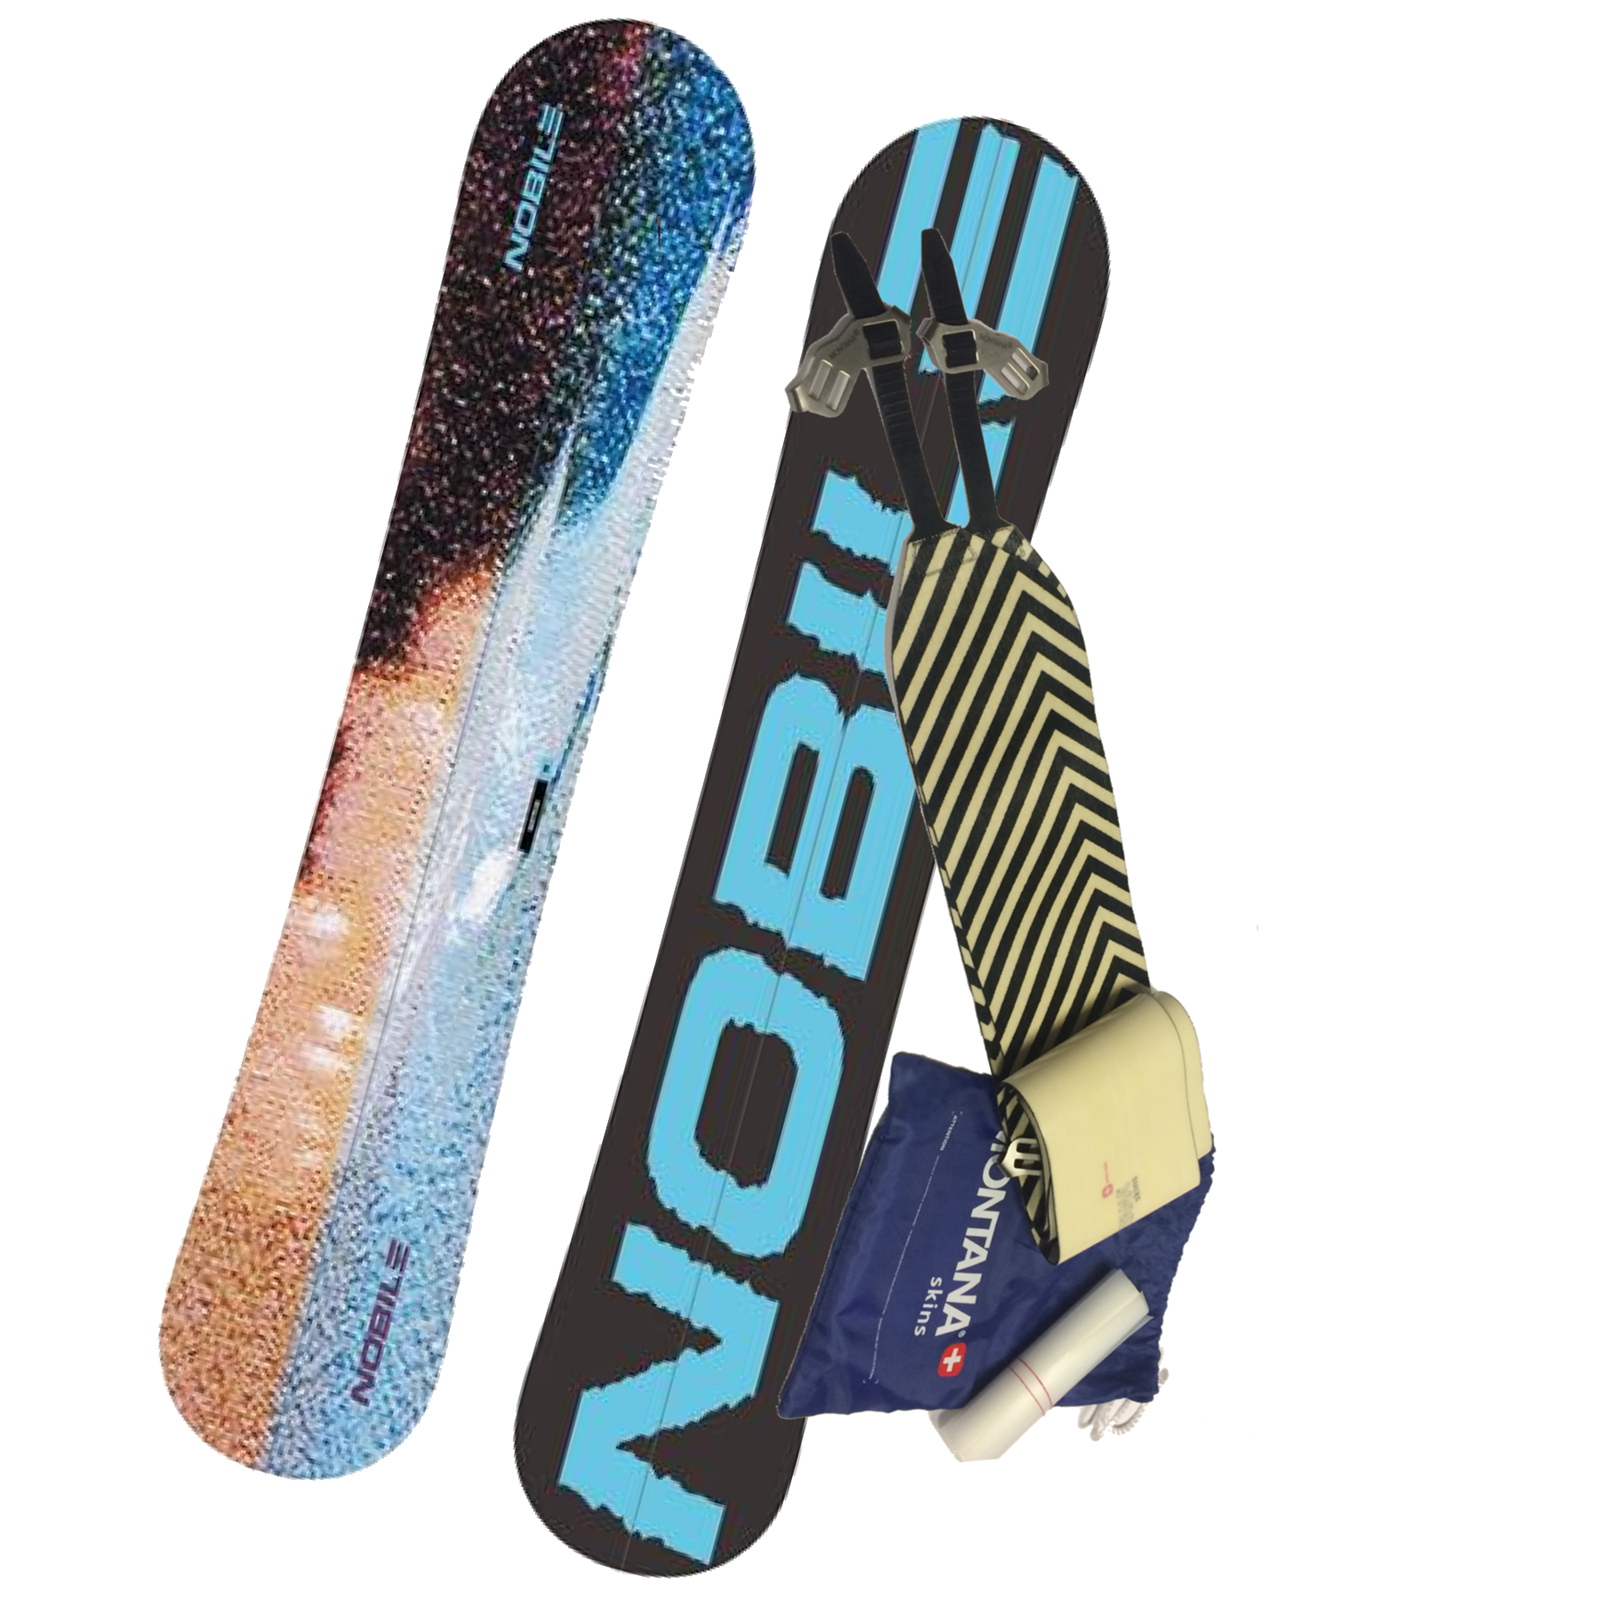 set split snowboard 2017 Nobile Sastrugi 159 cm+ stoupací pásy MONTANA Montamix